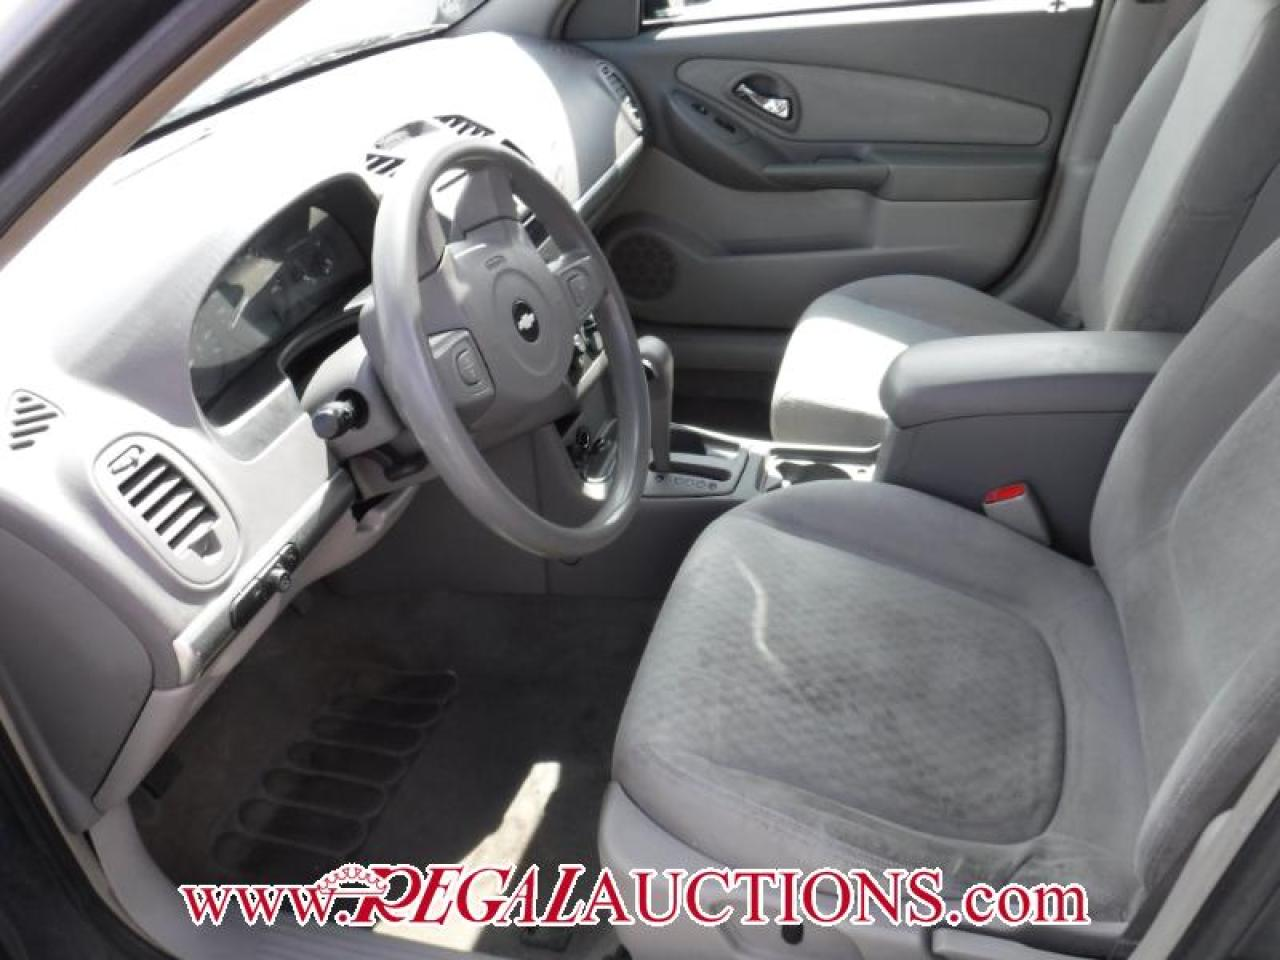 2005 Chevrolet MALIBU BASE 4D SEDAN